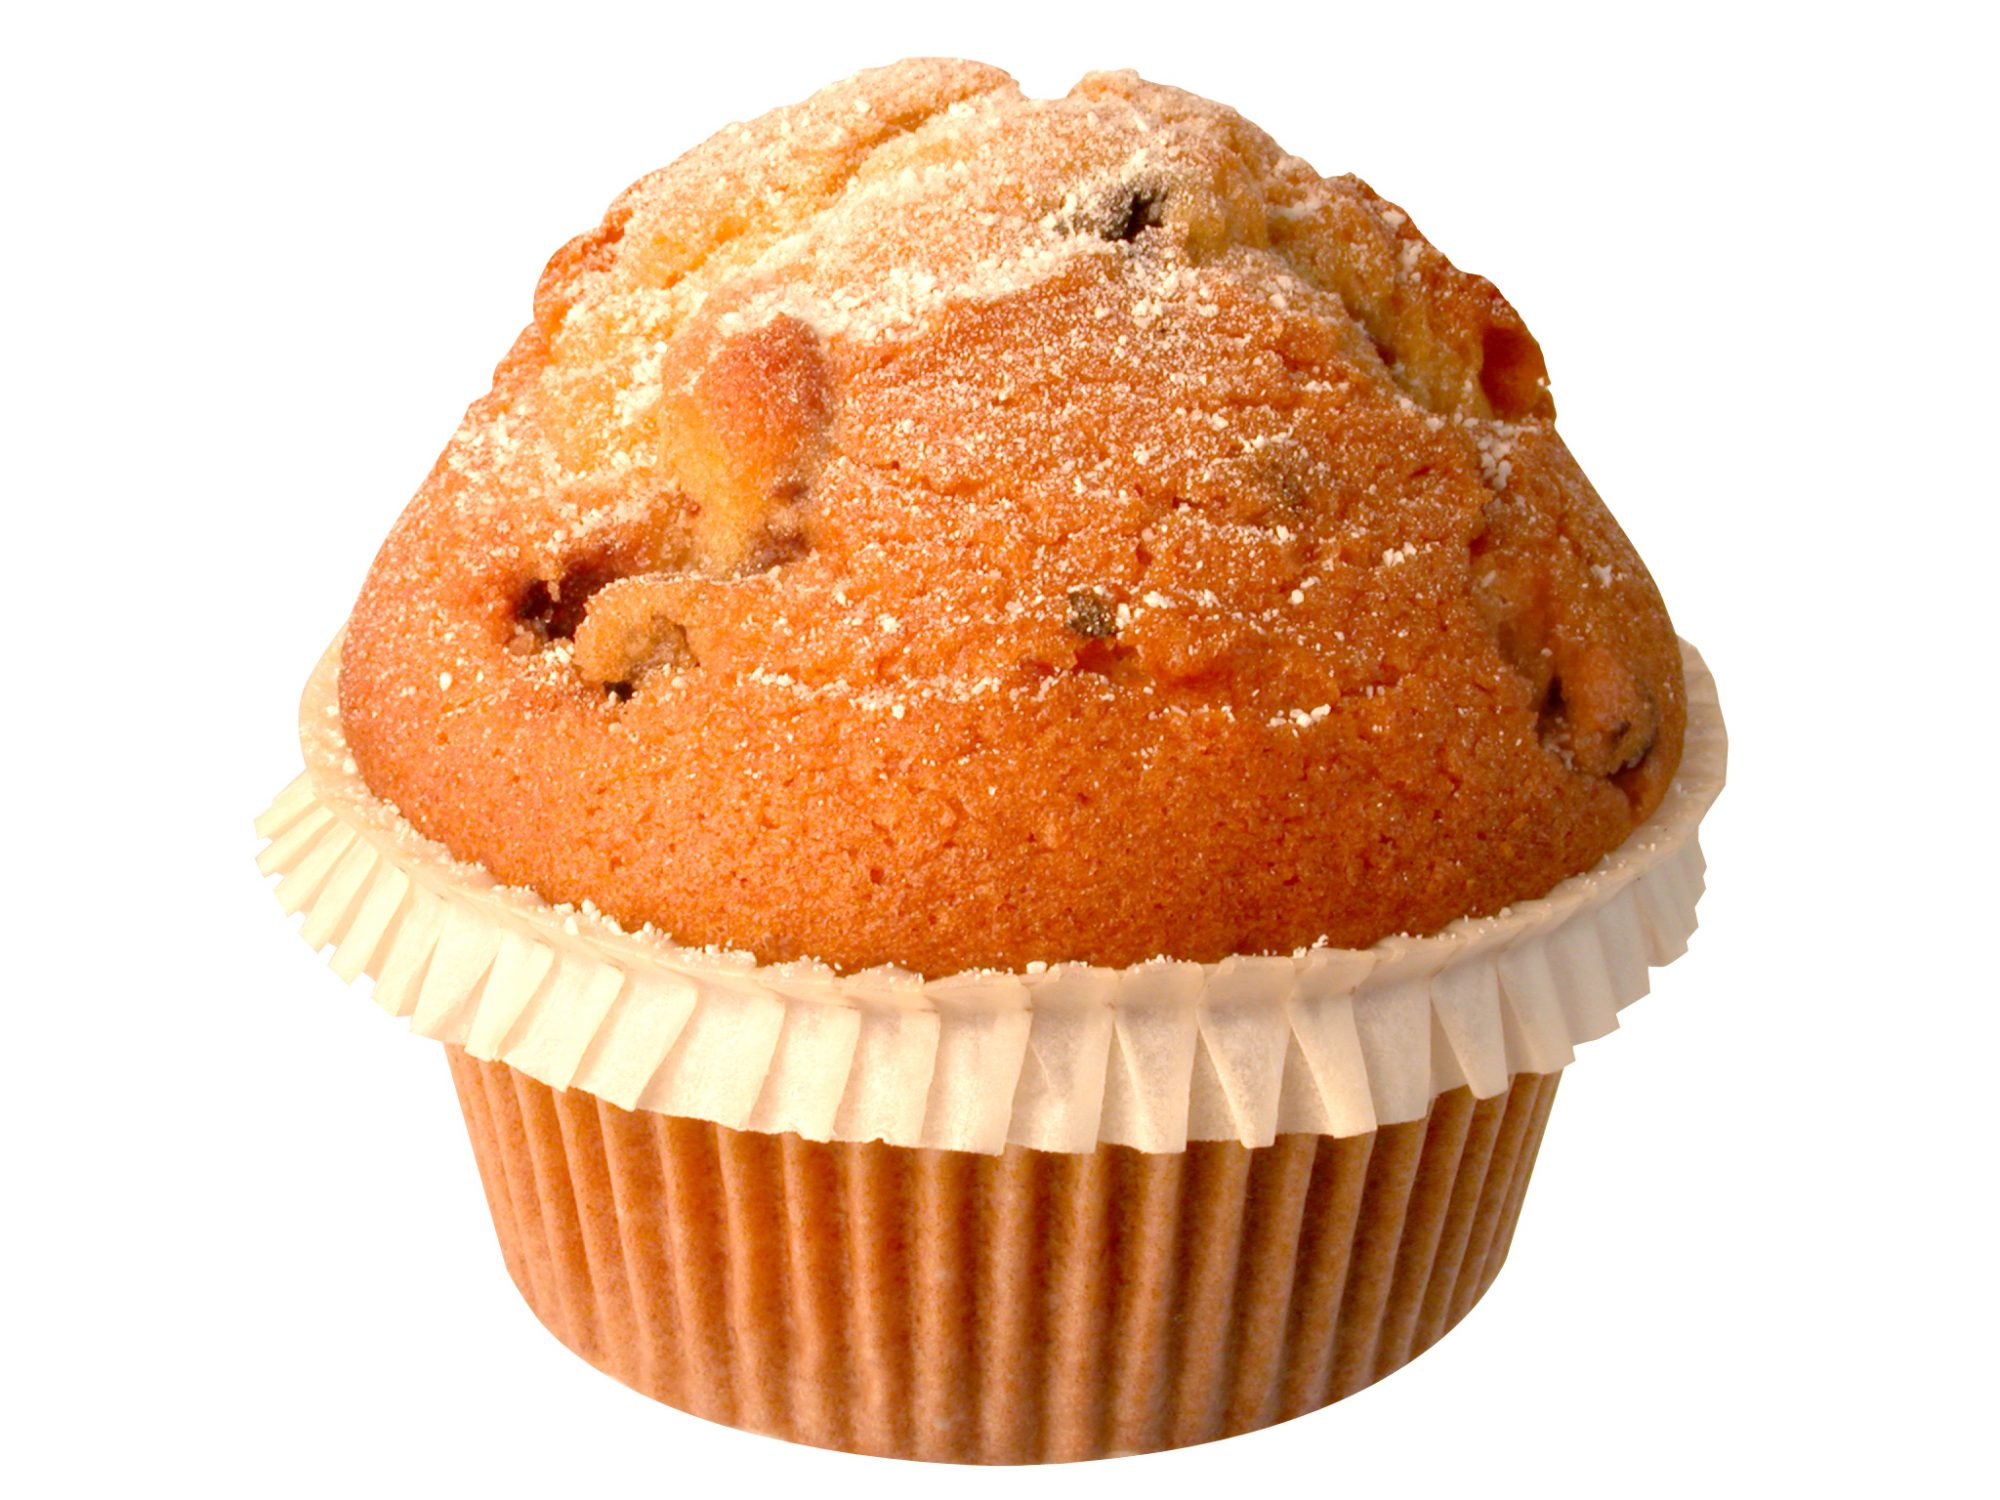 getty-muffin-image